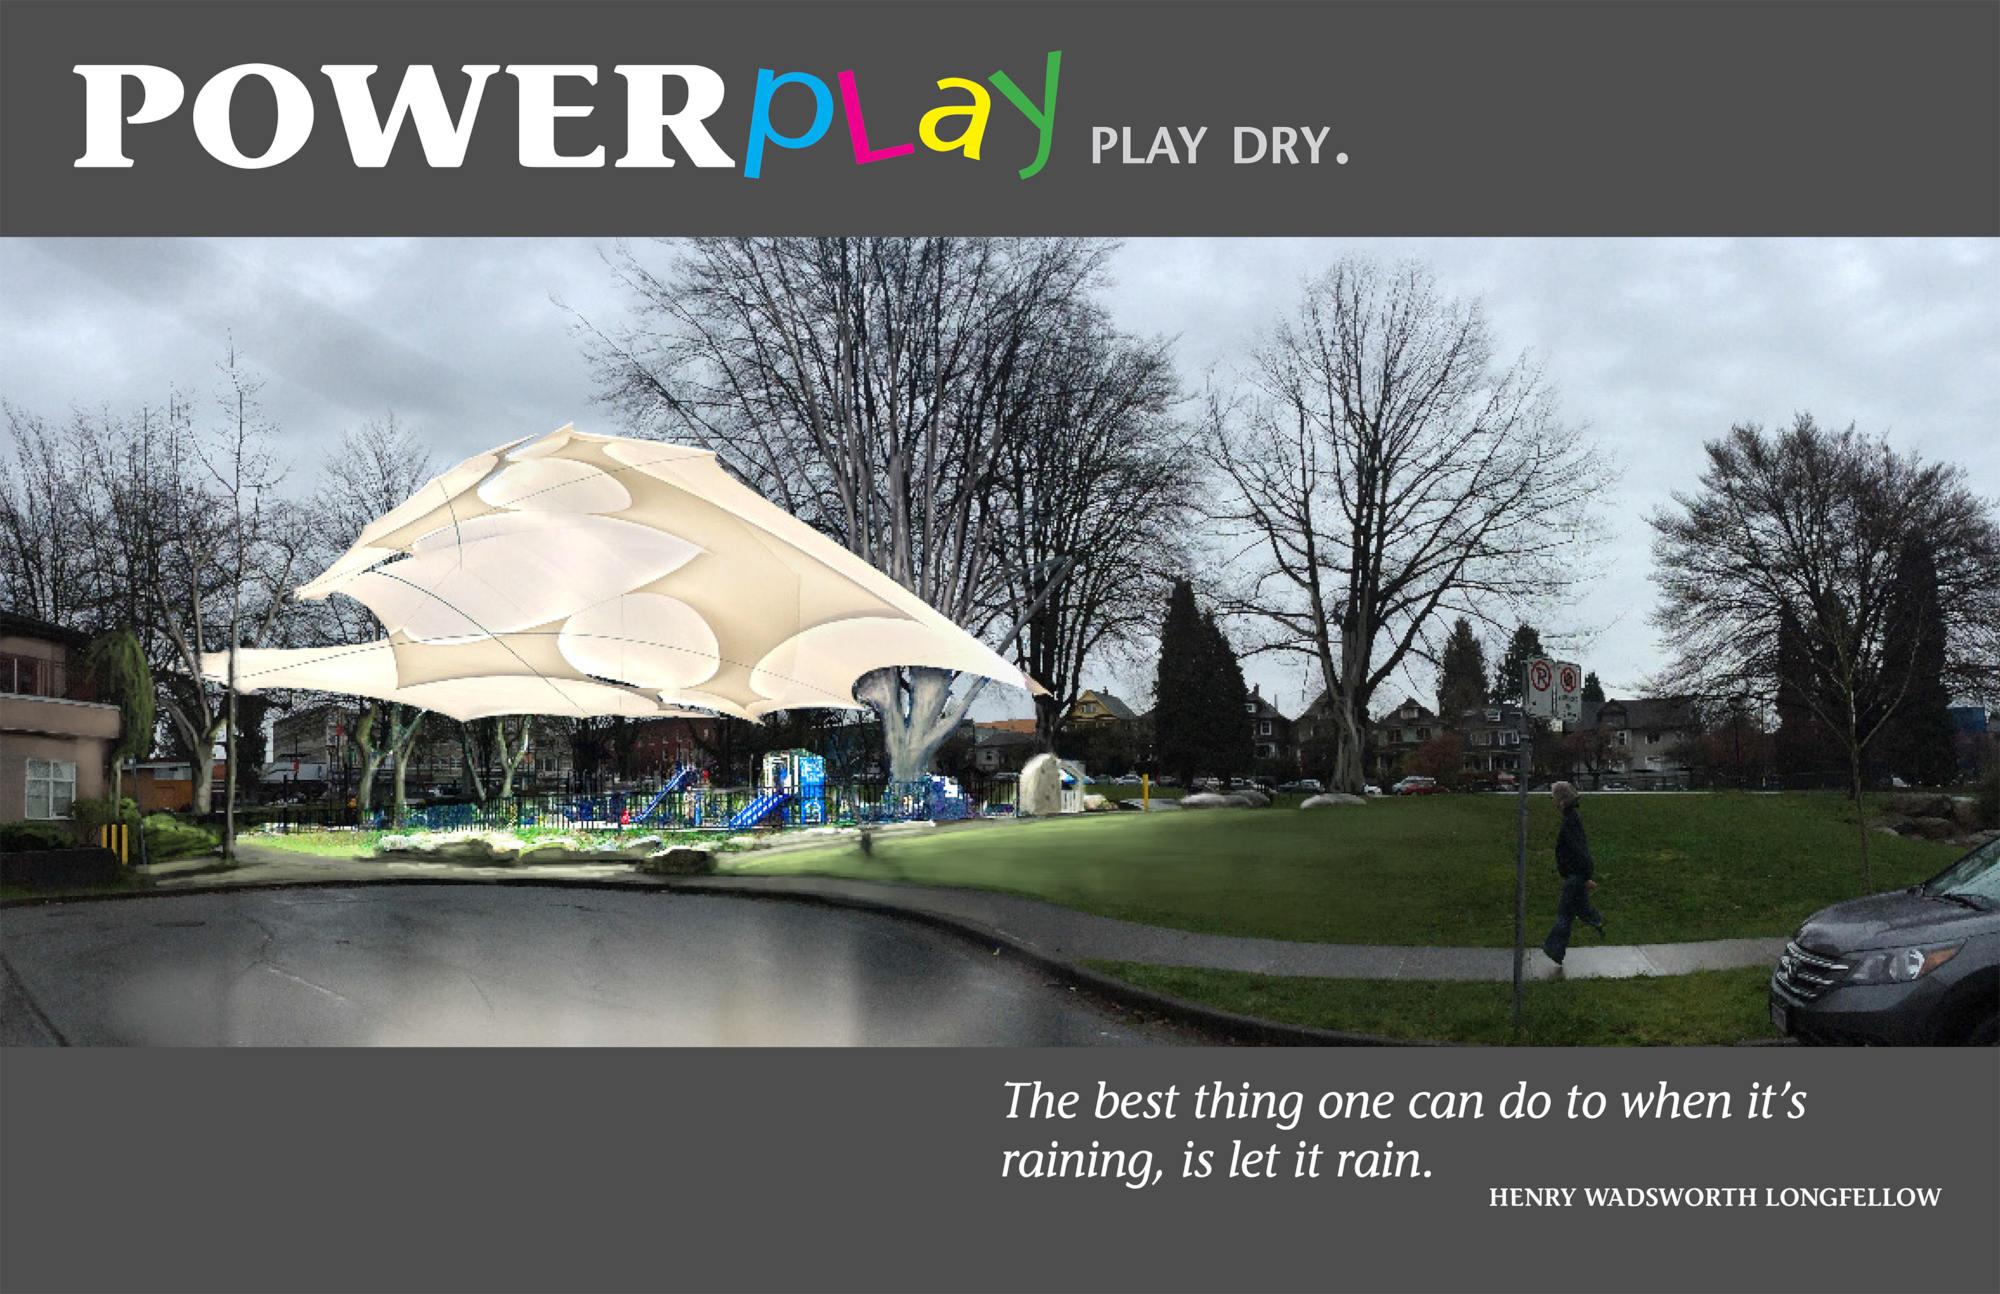 B4 - VPSN_Umbrellas_Competition_d1 - 11-2.jpg